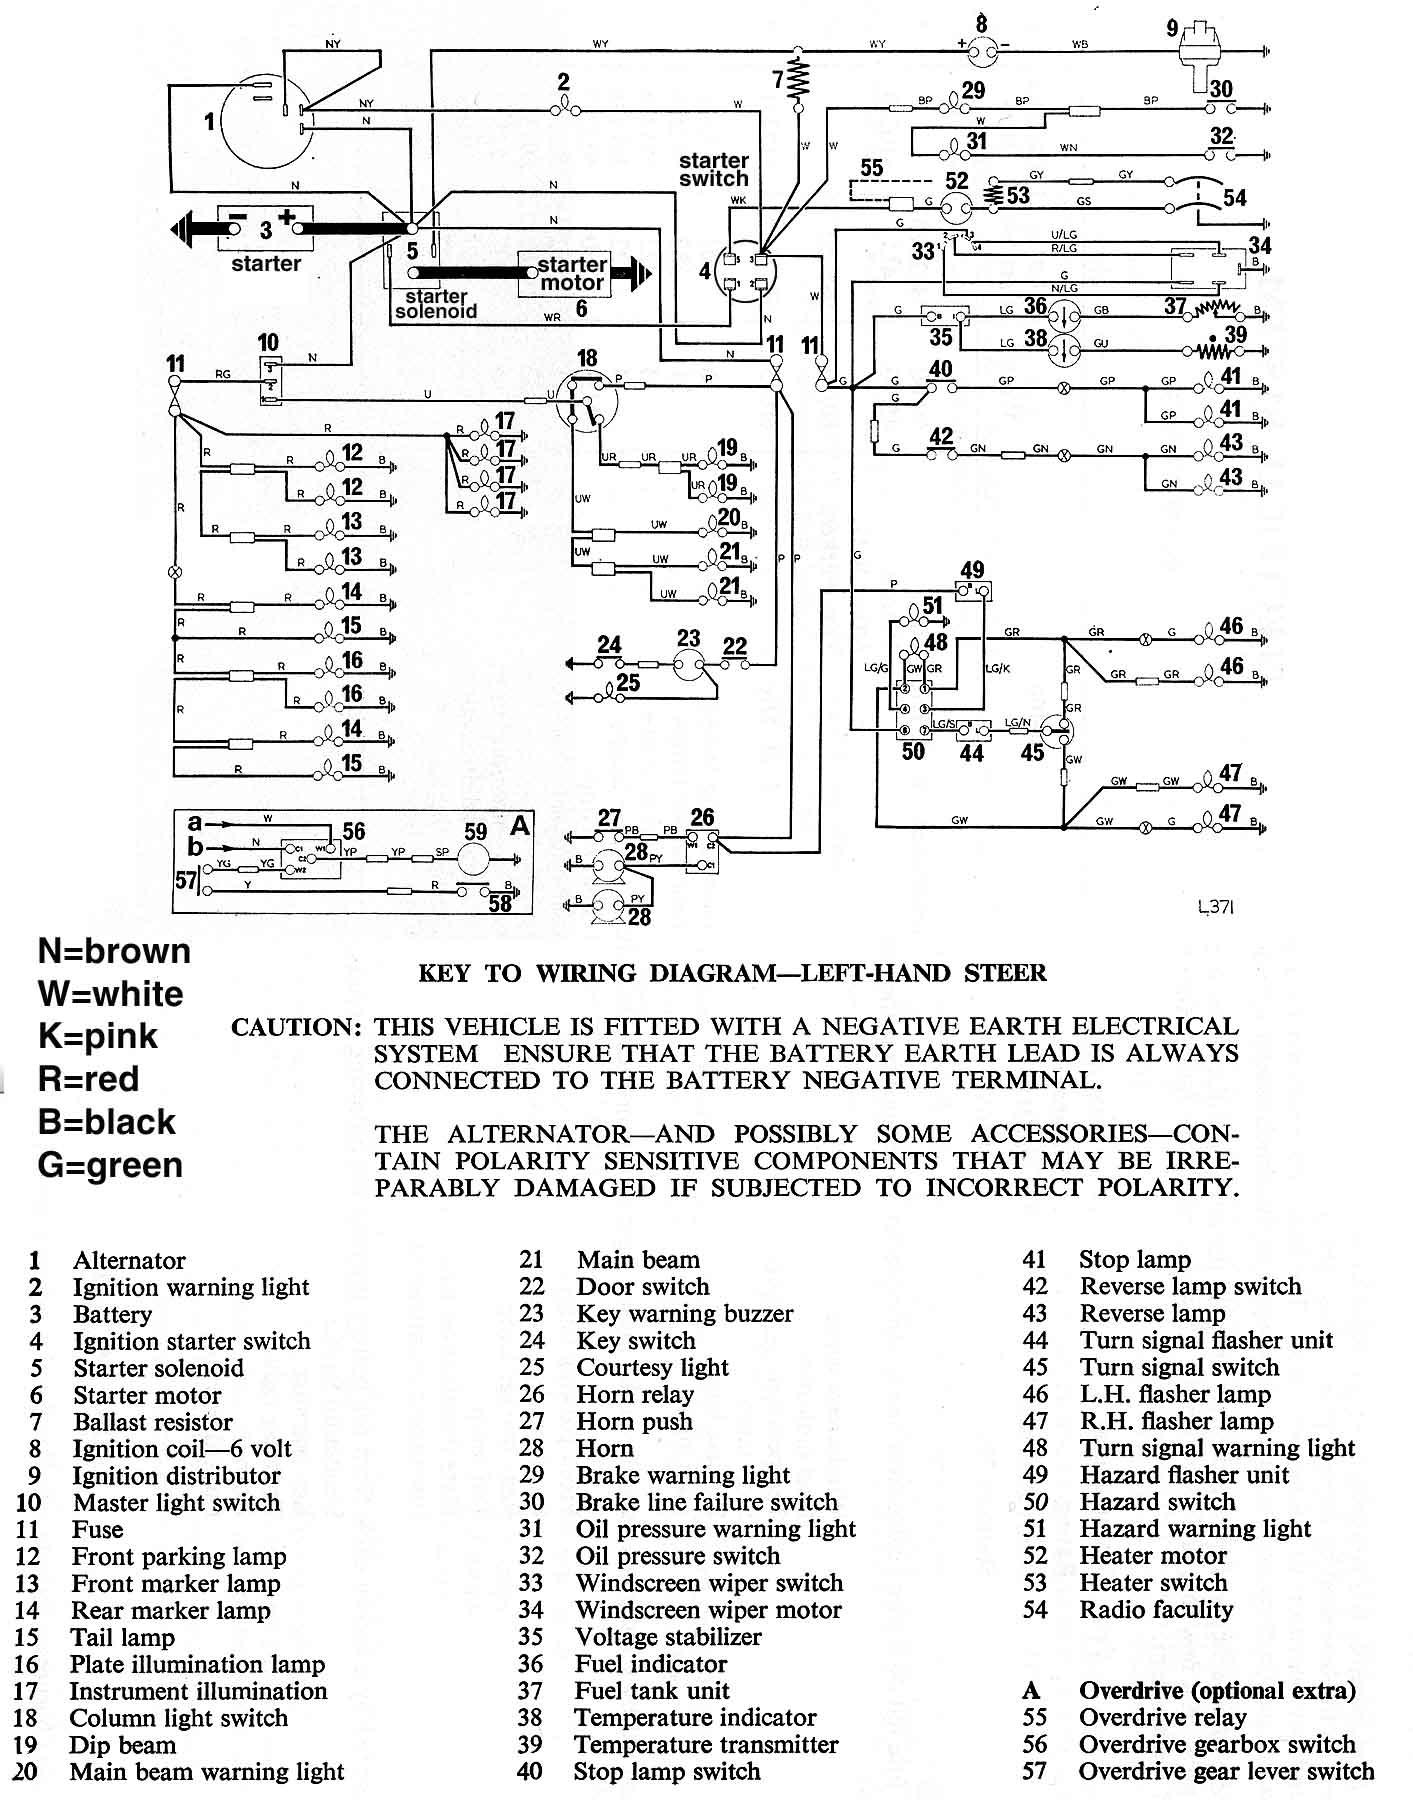 Vdo Oil Pressure Sending Unit Wiring Diagram - Wiring Diagrams ...